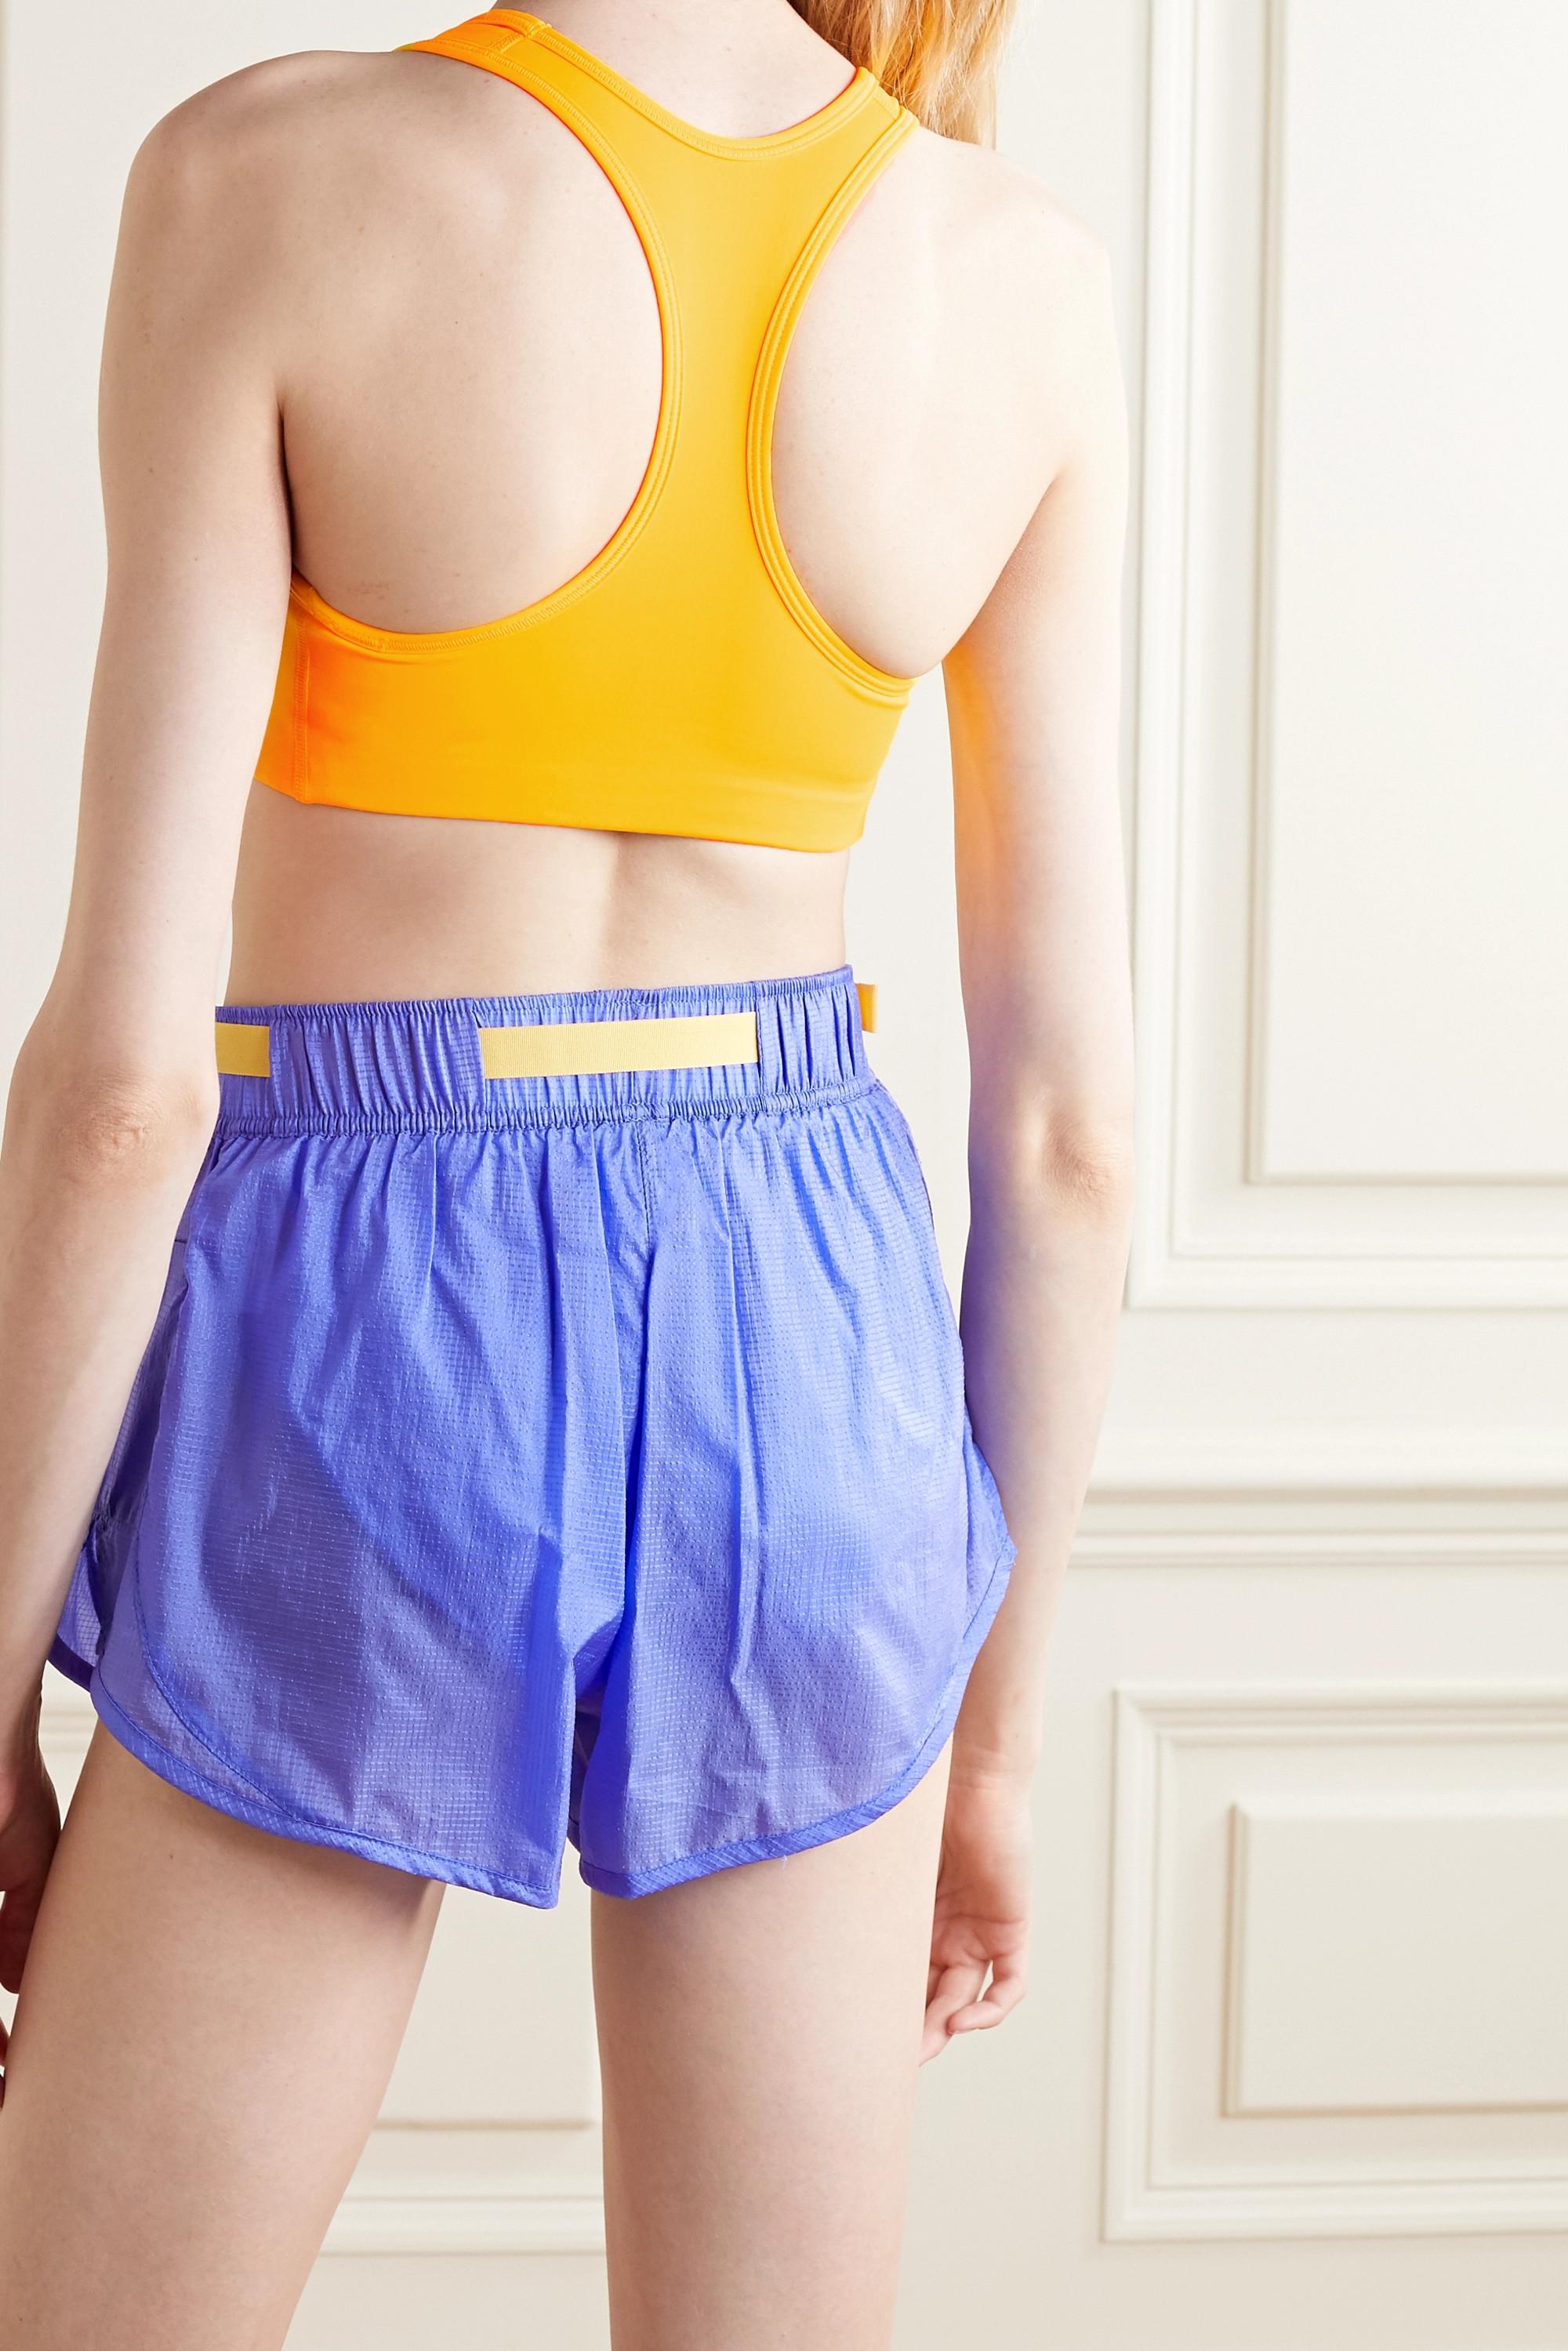 Nike + NET SUSTAIN Swoosh Dri-FIT stretch sports bra